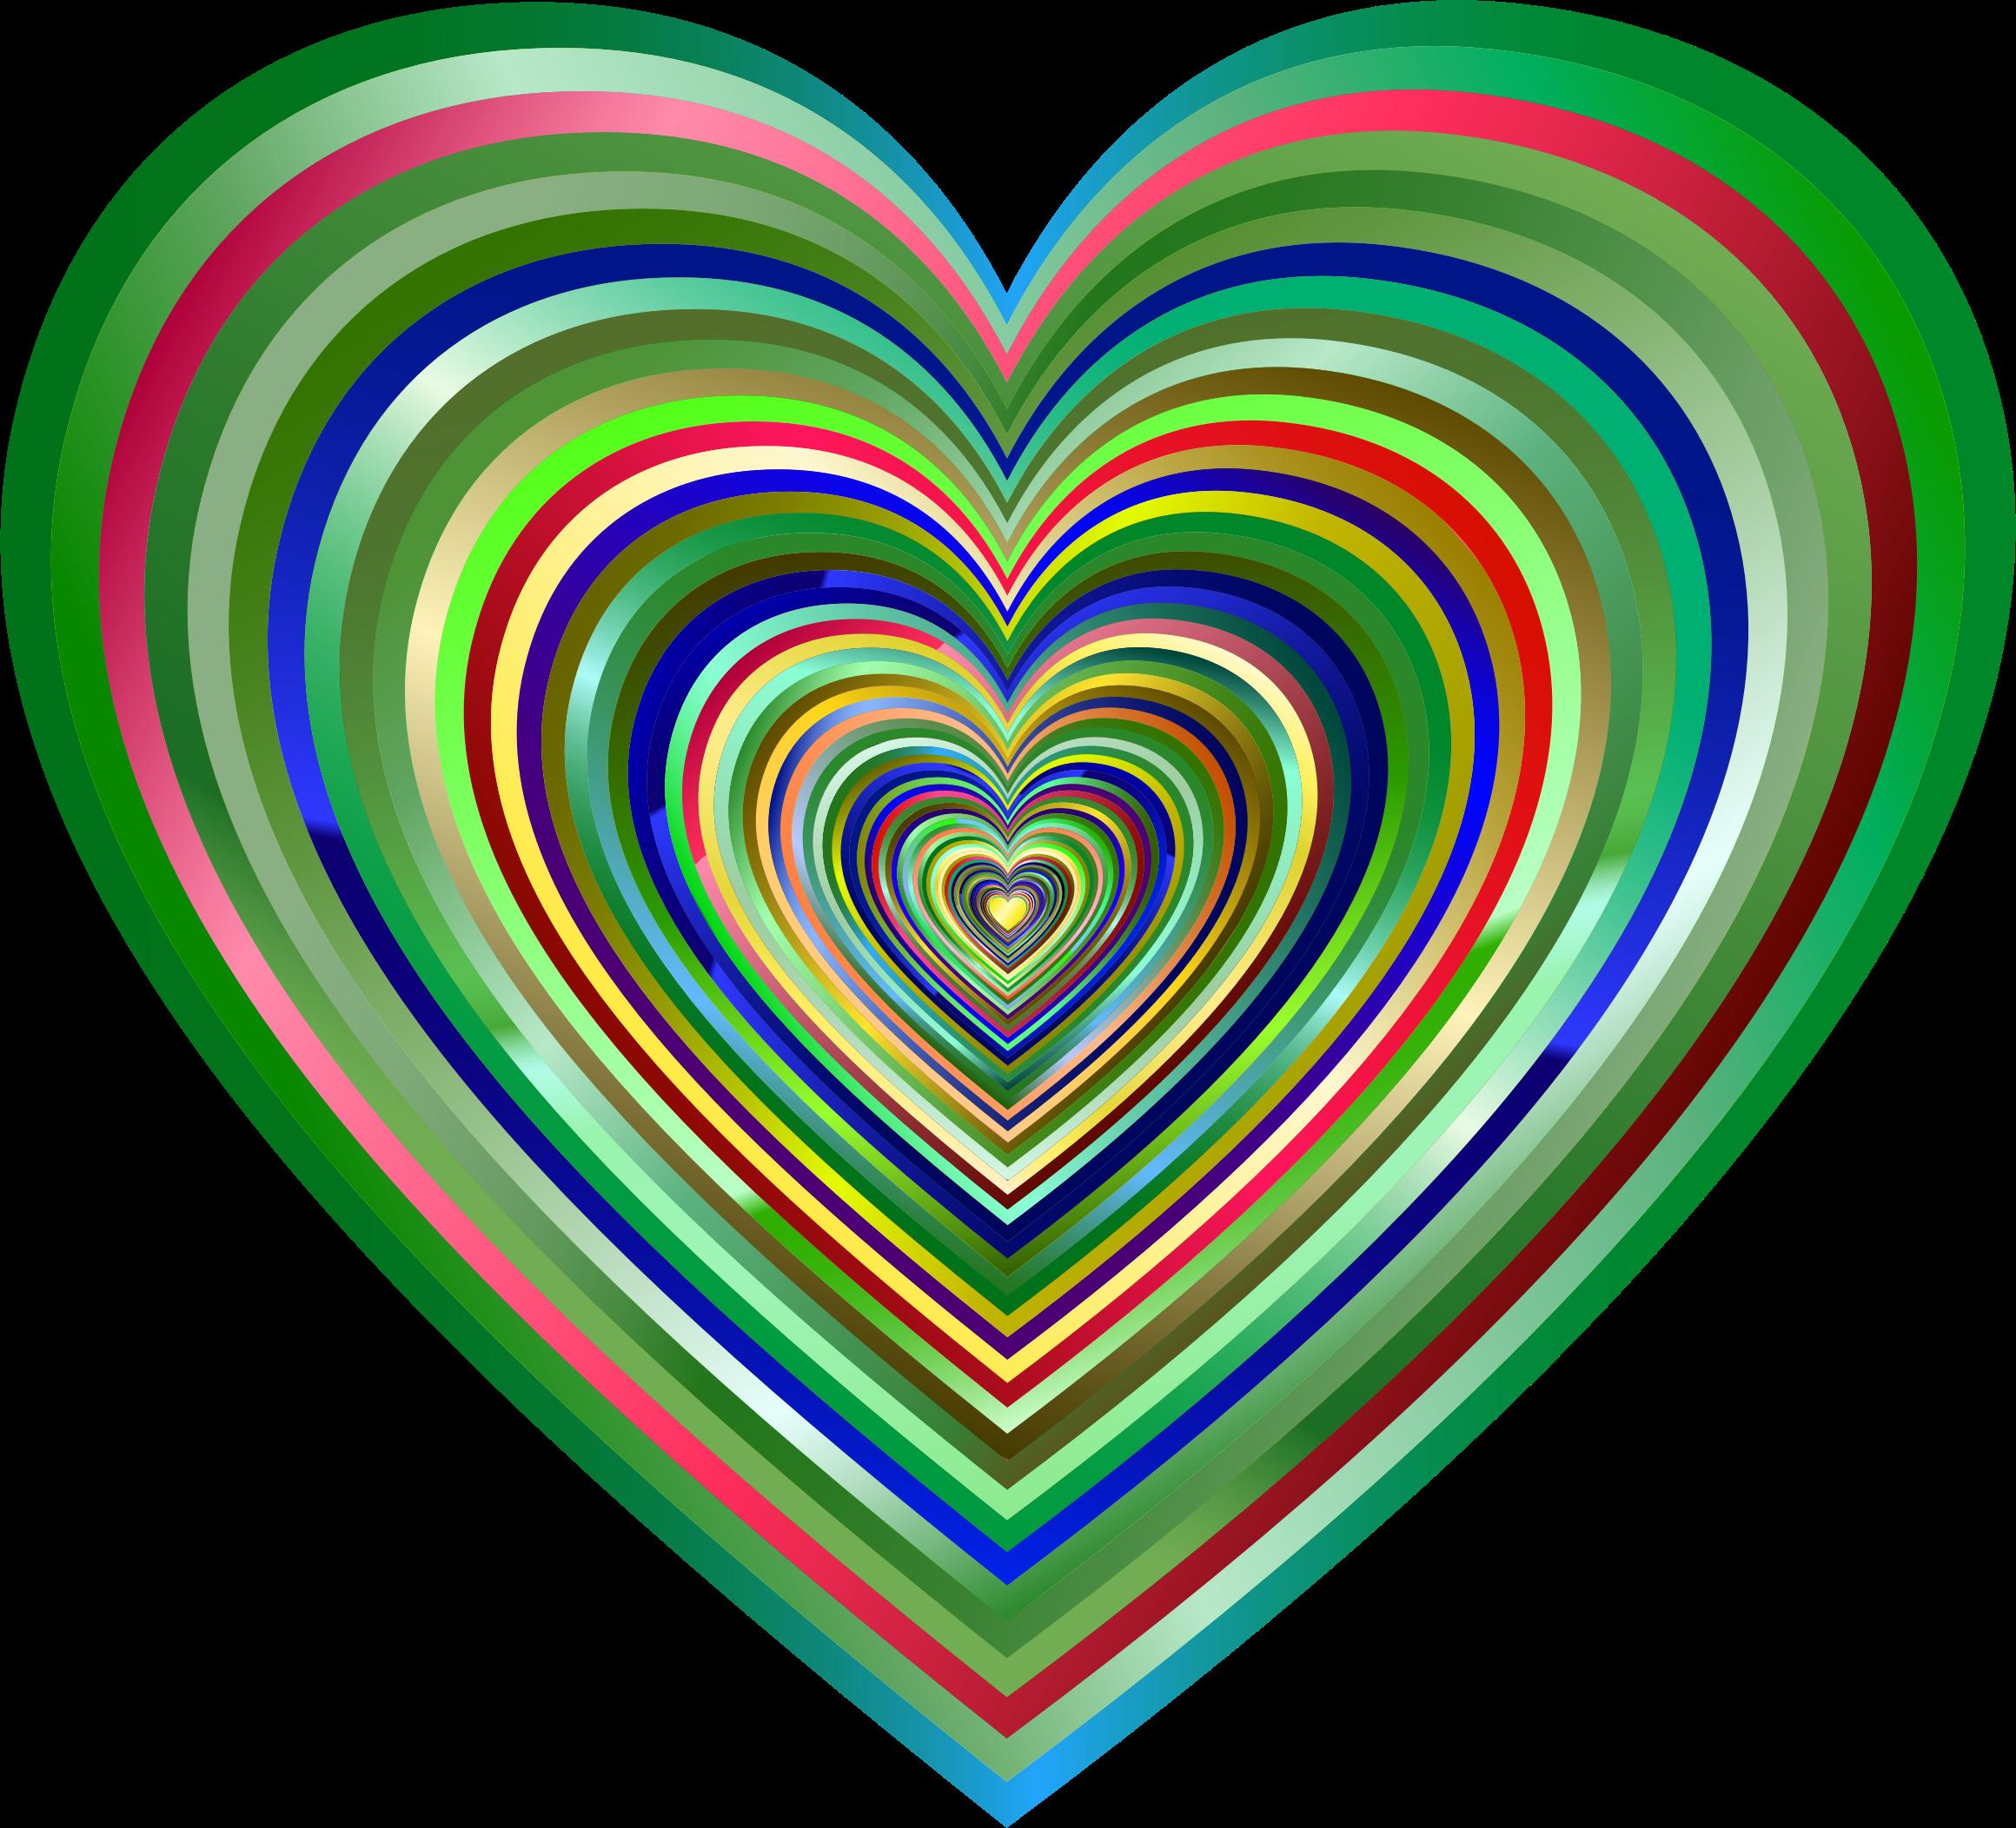 Cracked And Broken Heart Vector Clipart Image - Heart Shape, HD Png  Download , Transparent Png Image - PNGitem